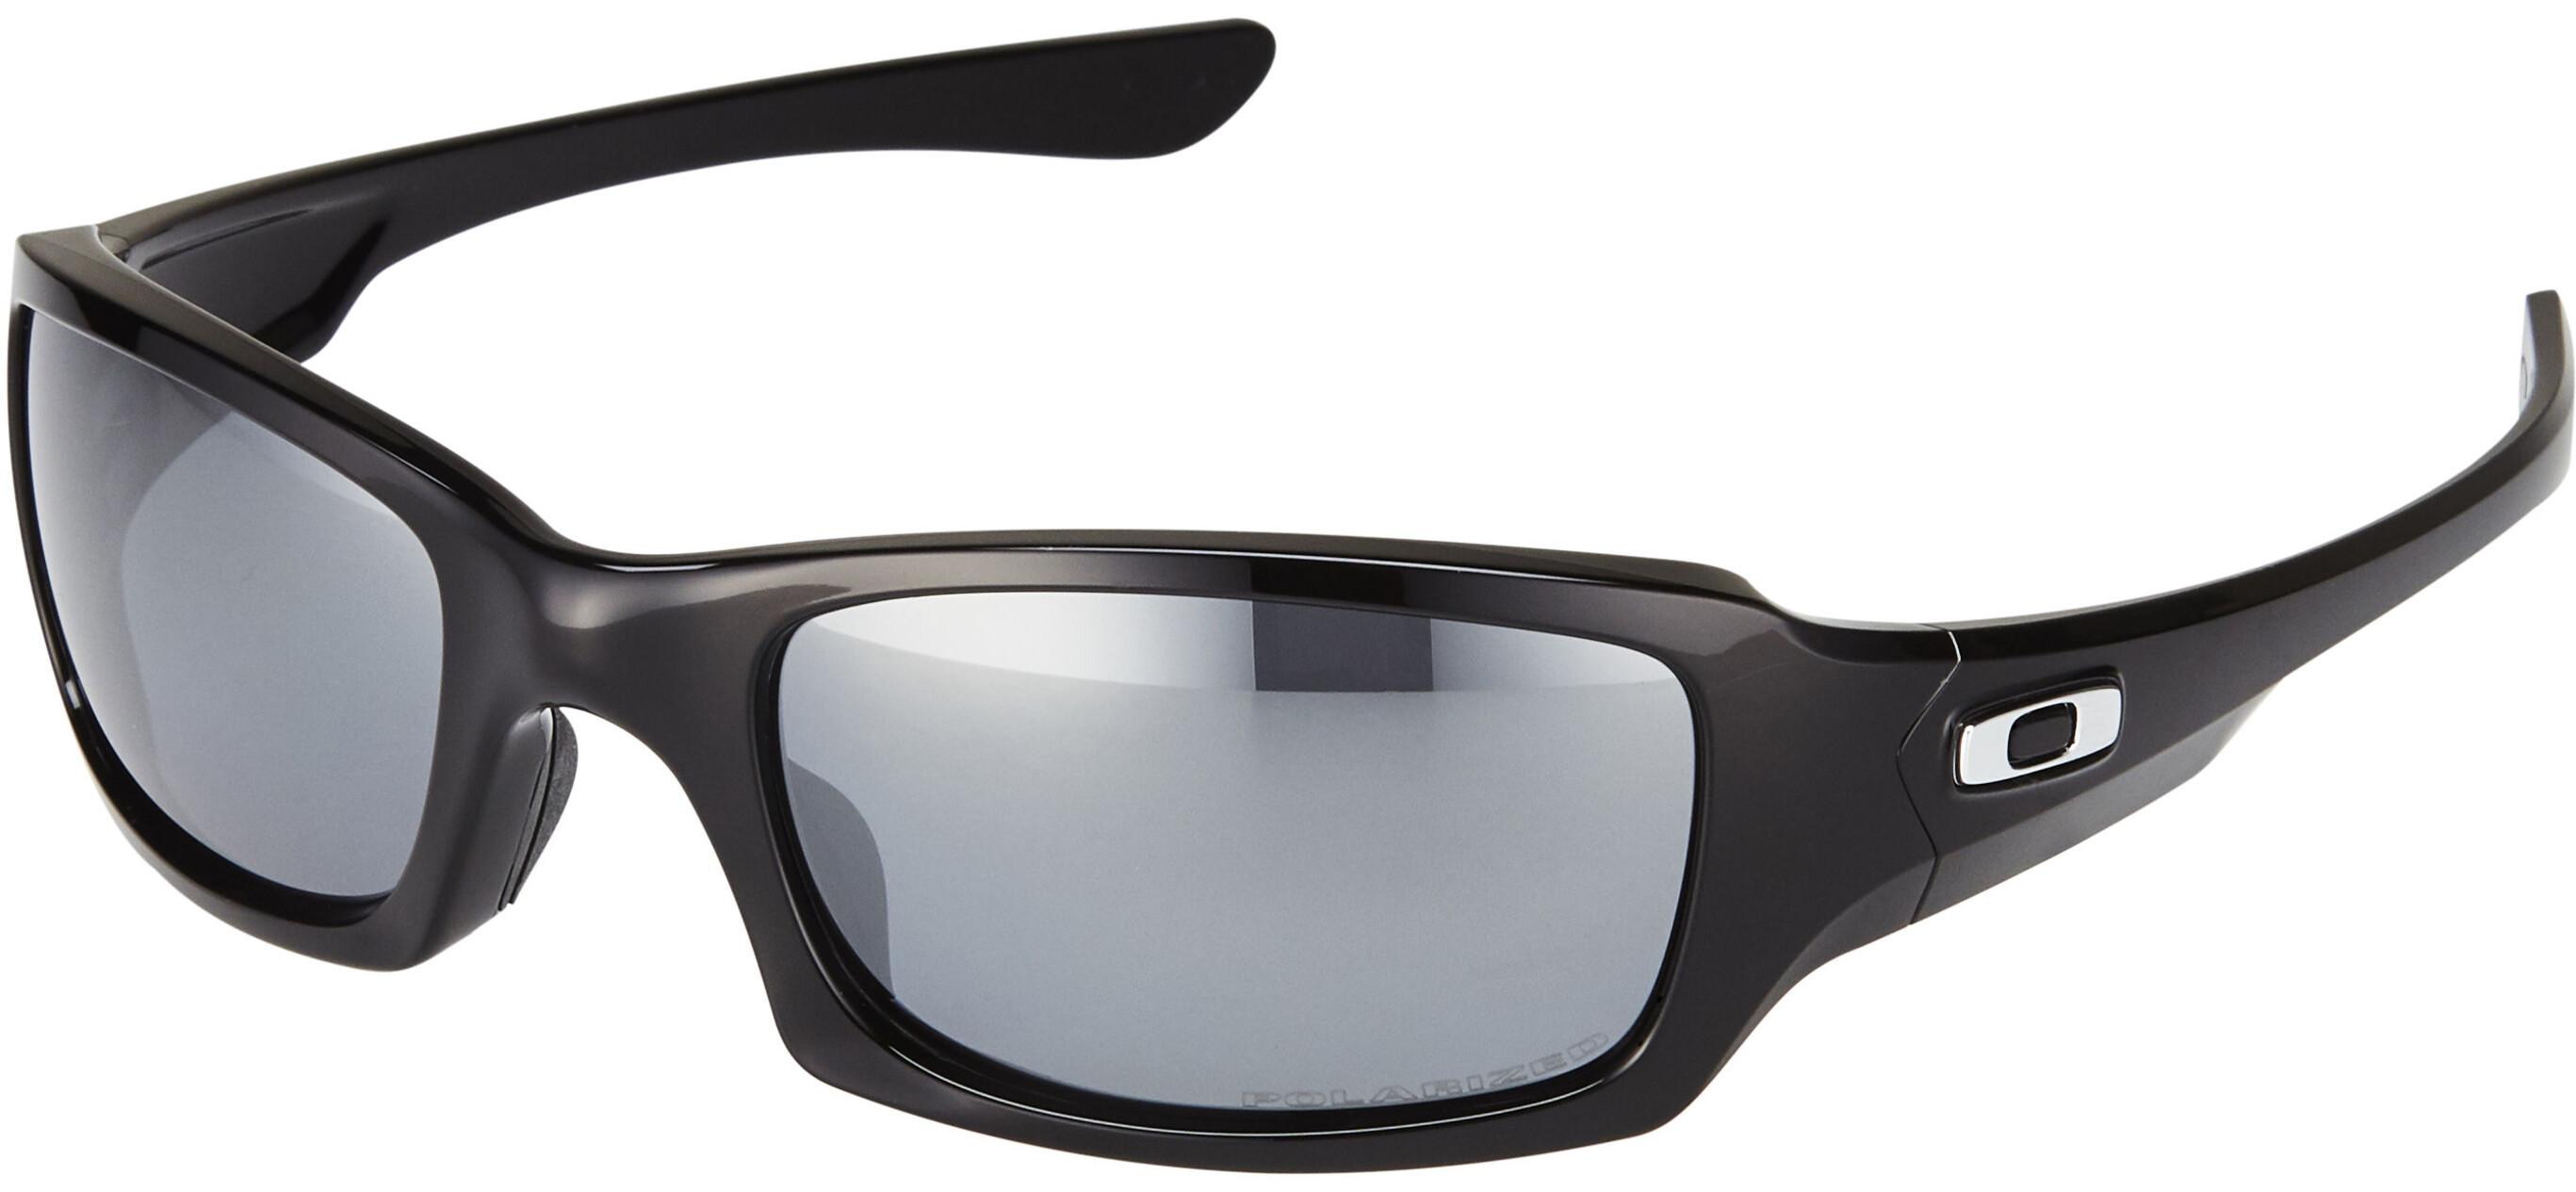 Oakley Fives Squared polished black black iridium polarized  0615e3a8c5